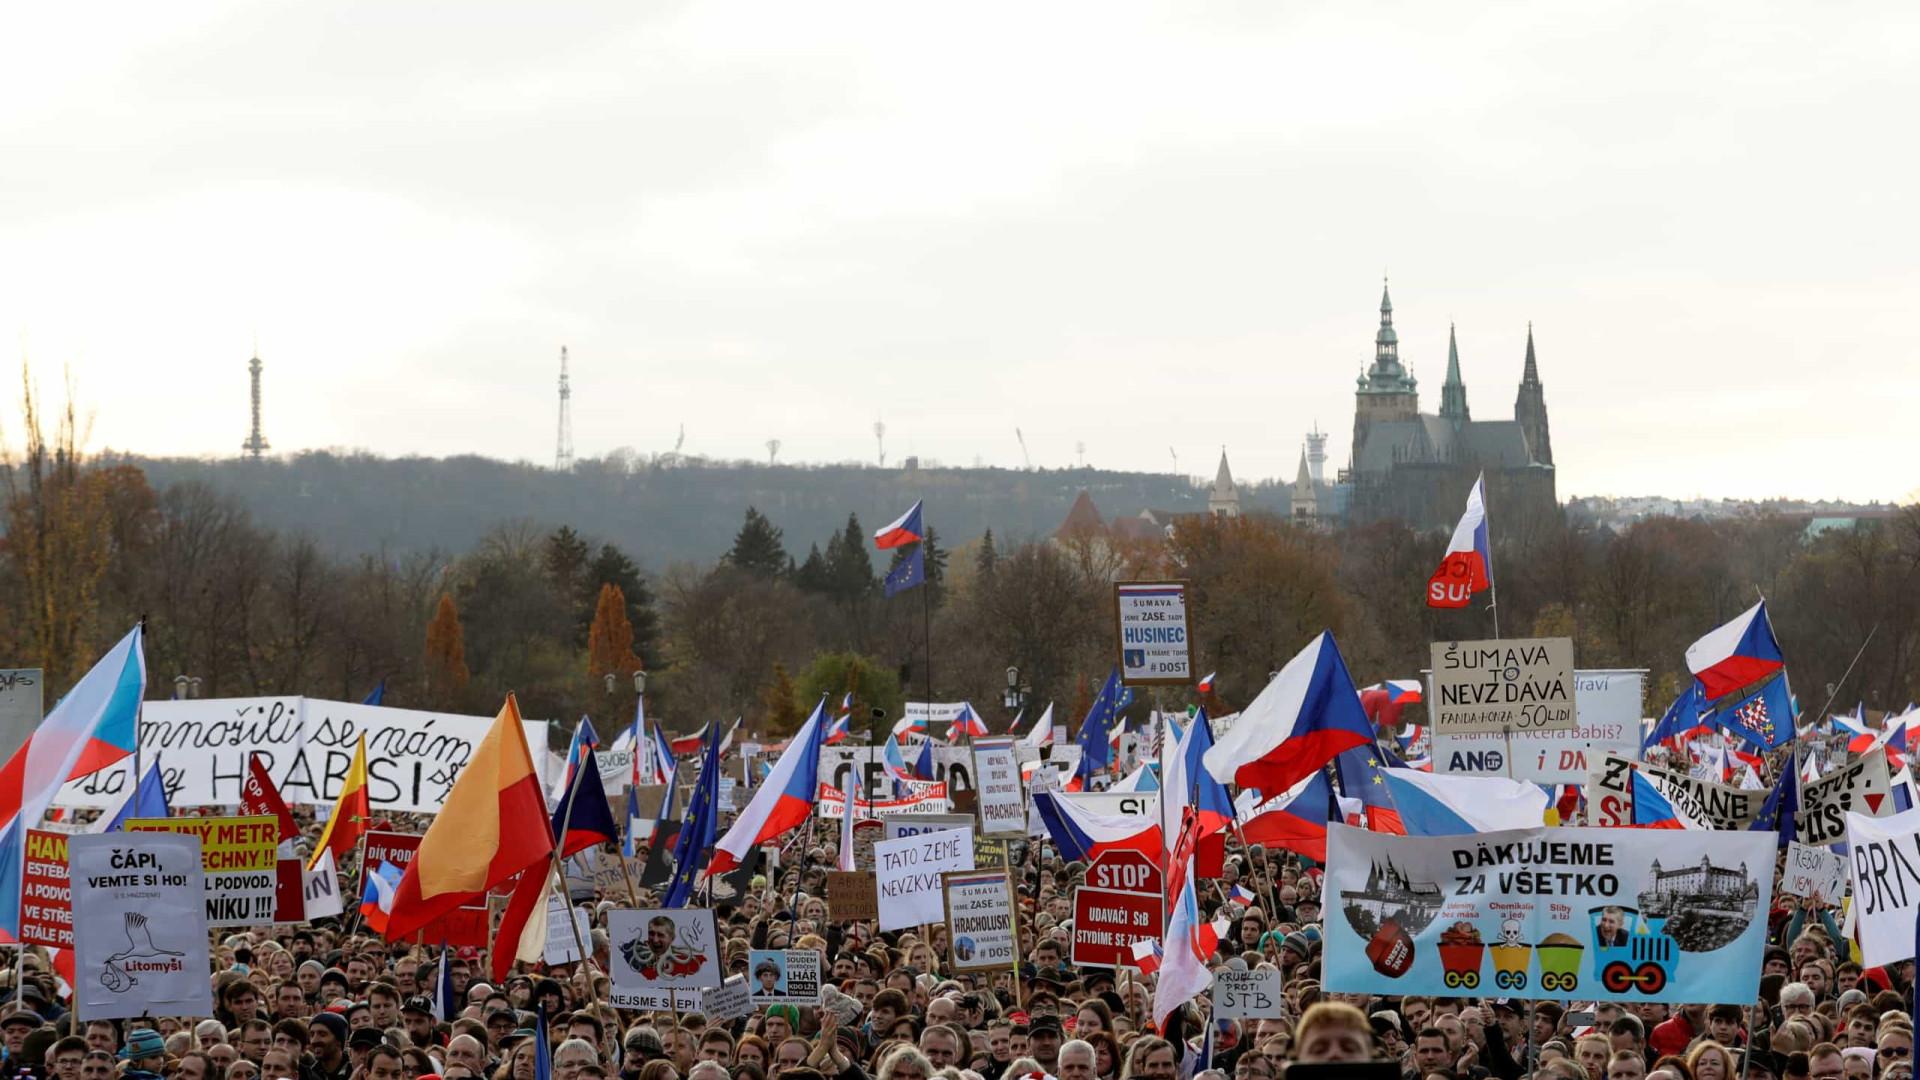 Praga expulsa funcionários da embaixada russa por rumor de envenenamento